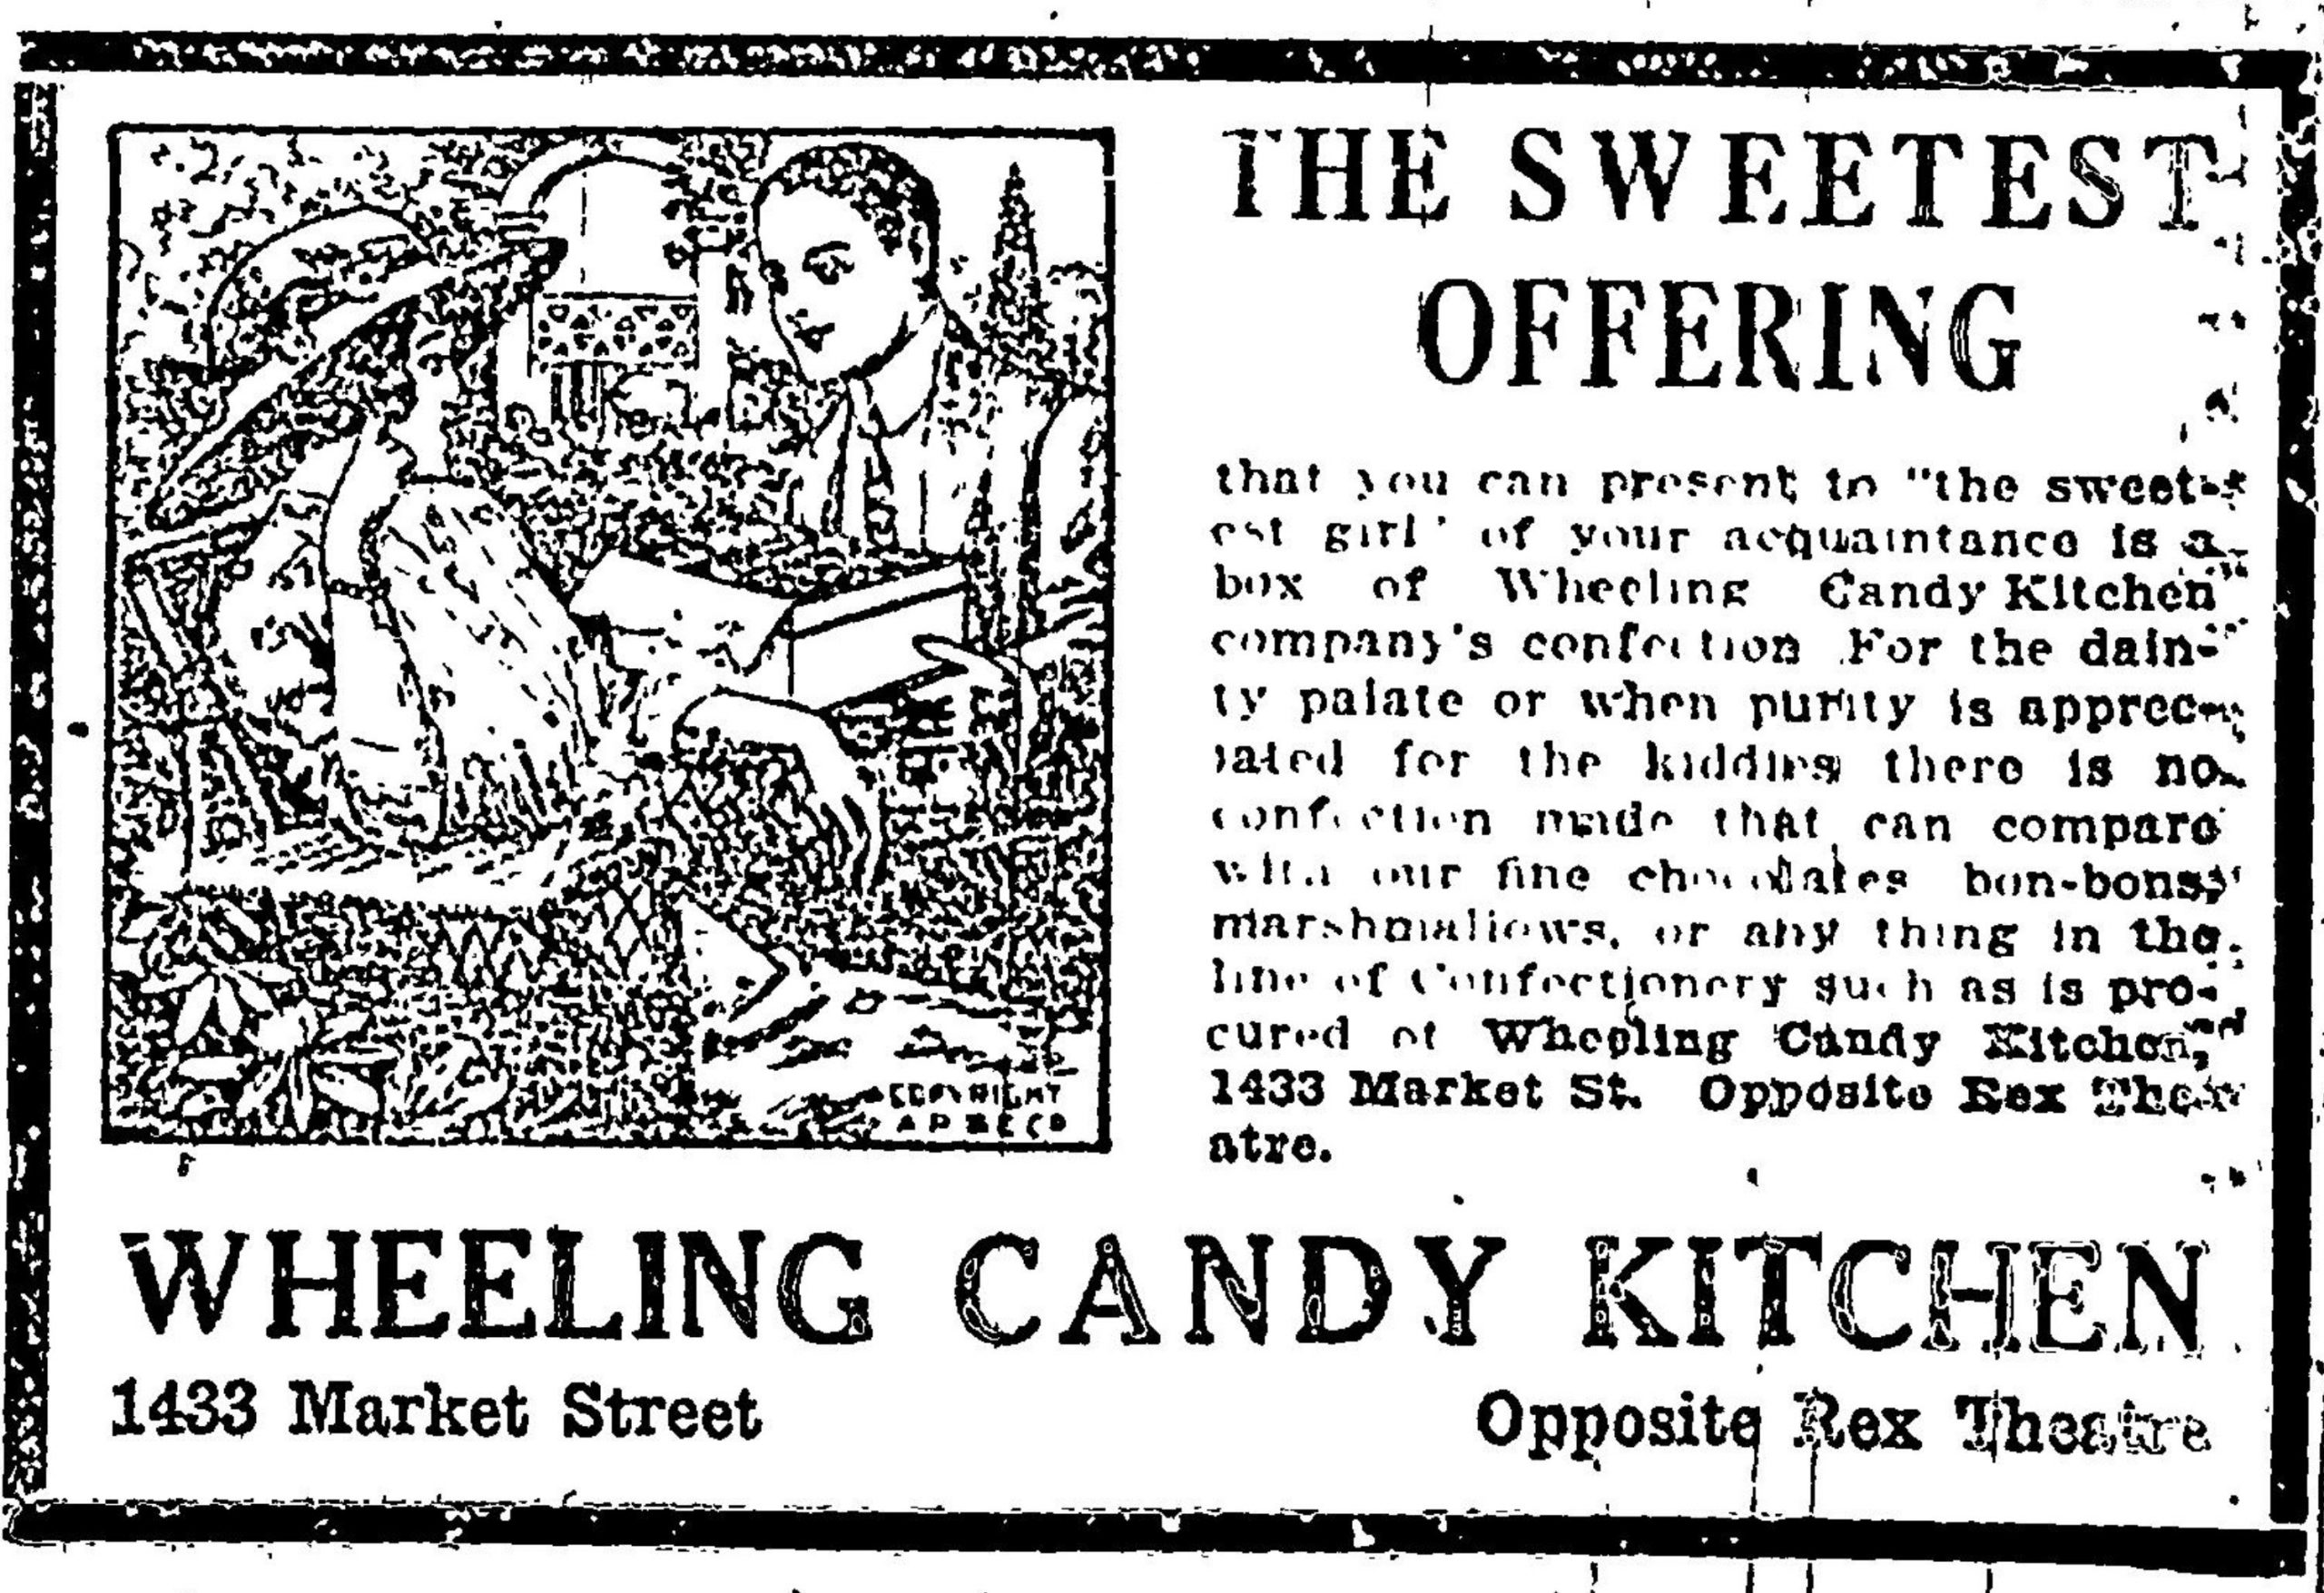 Wheeling Candy Kitchen